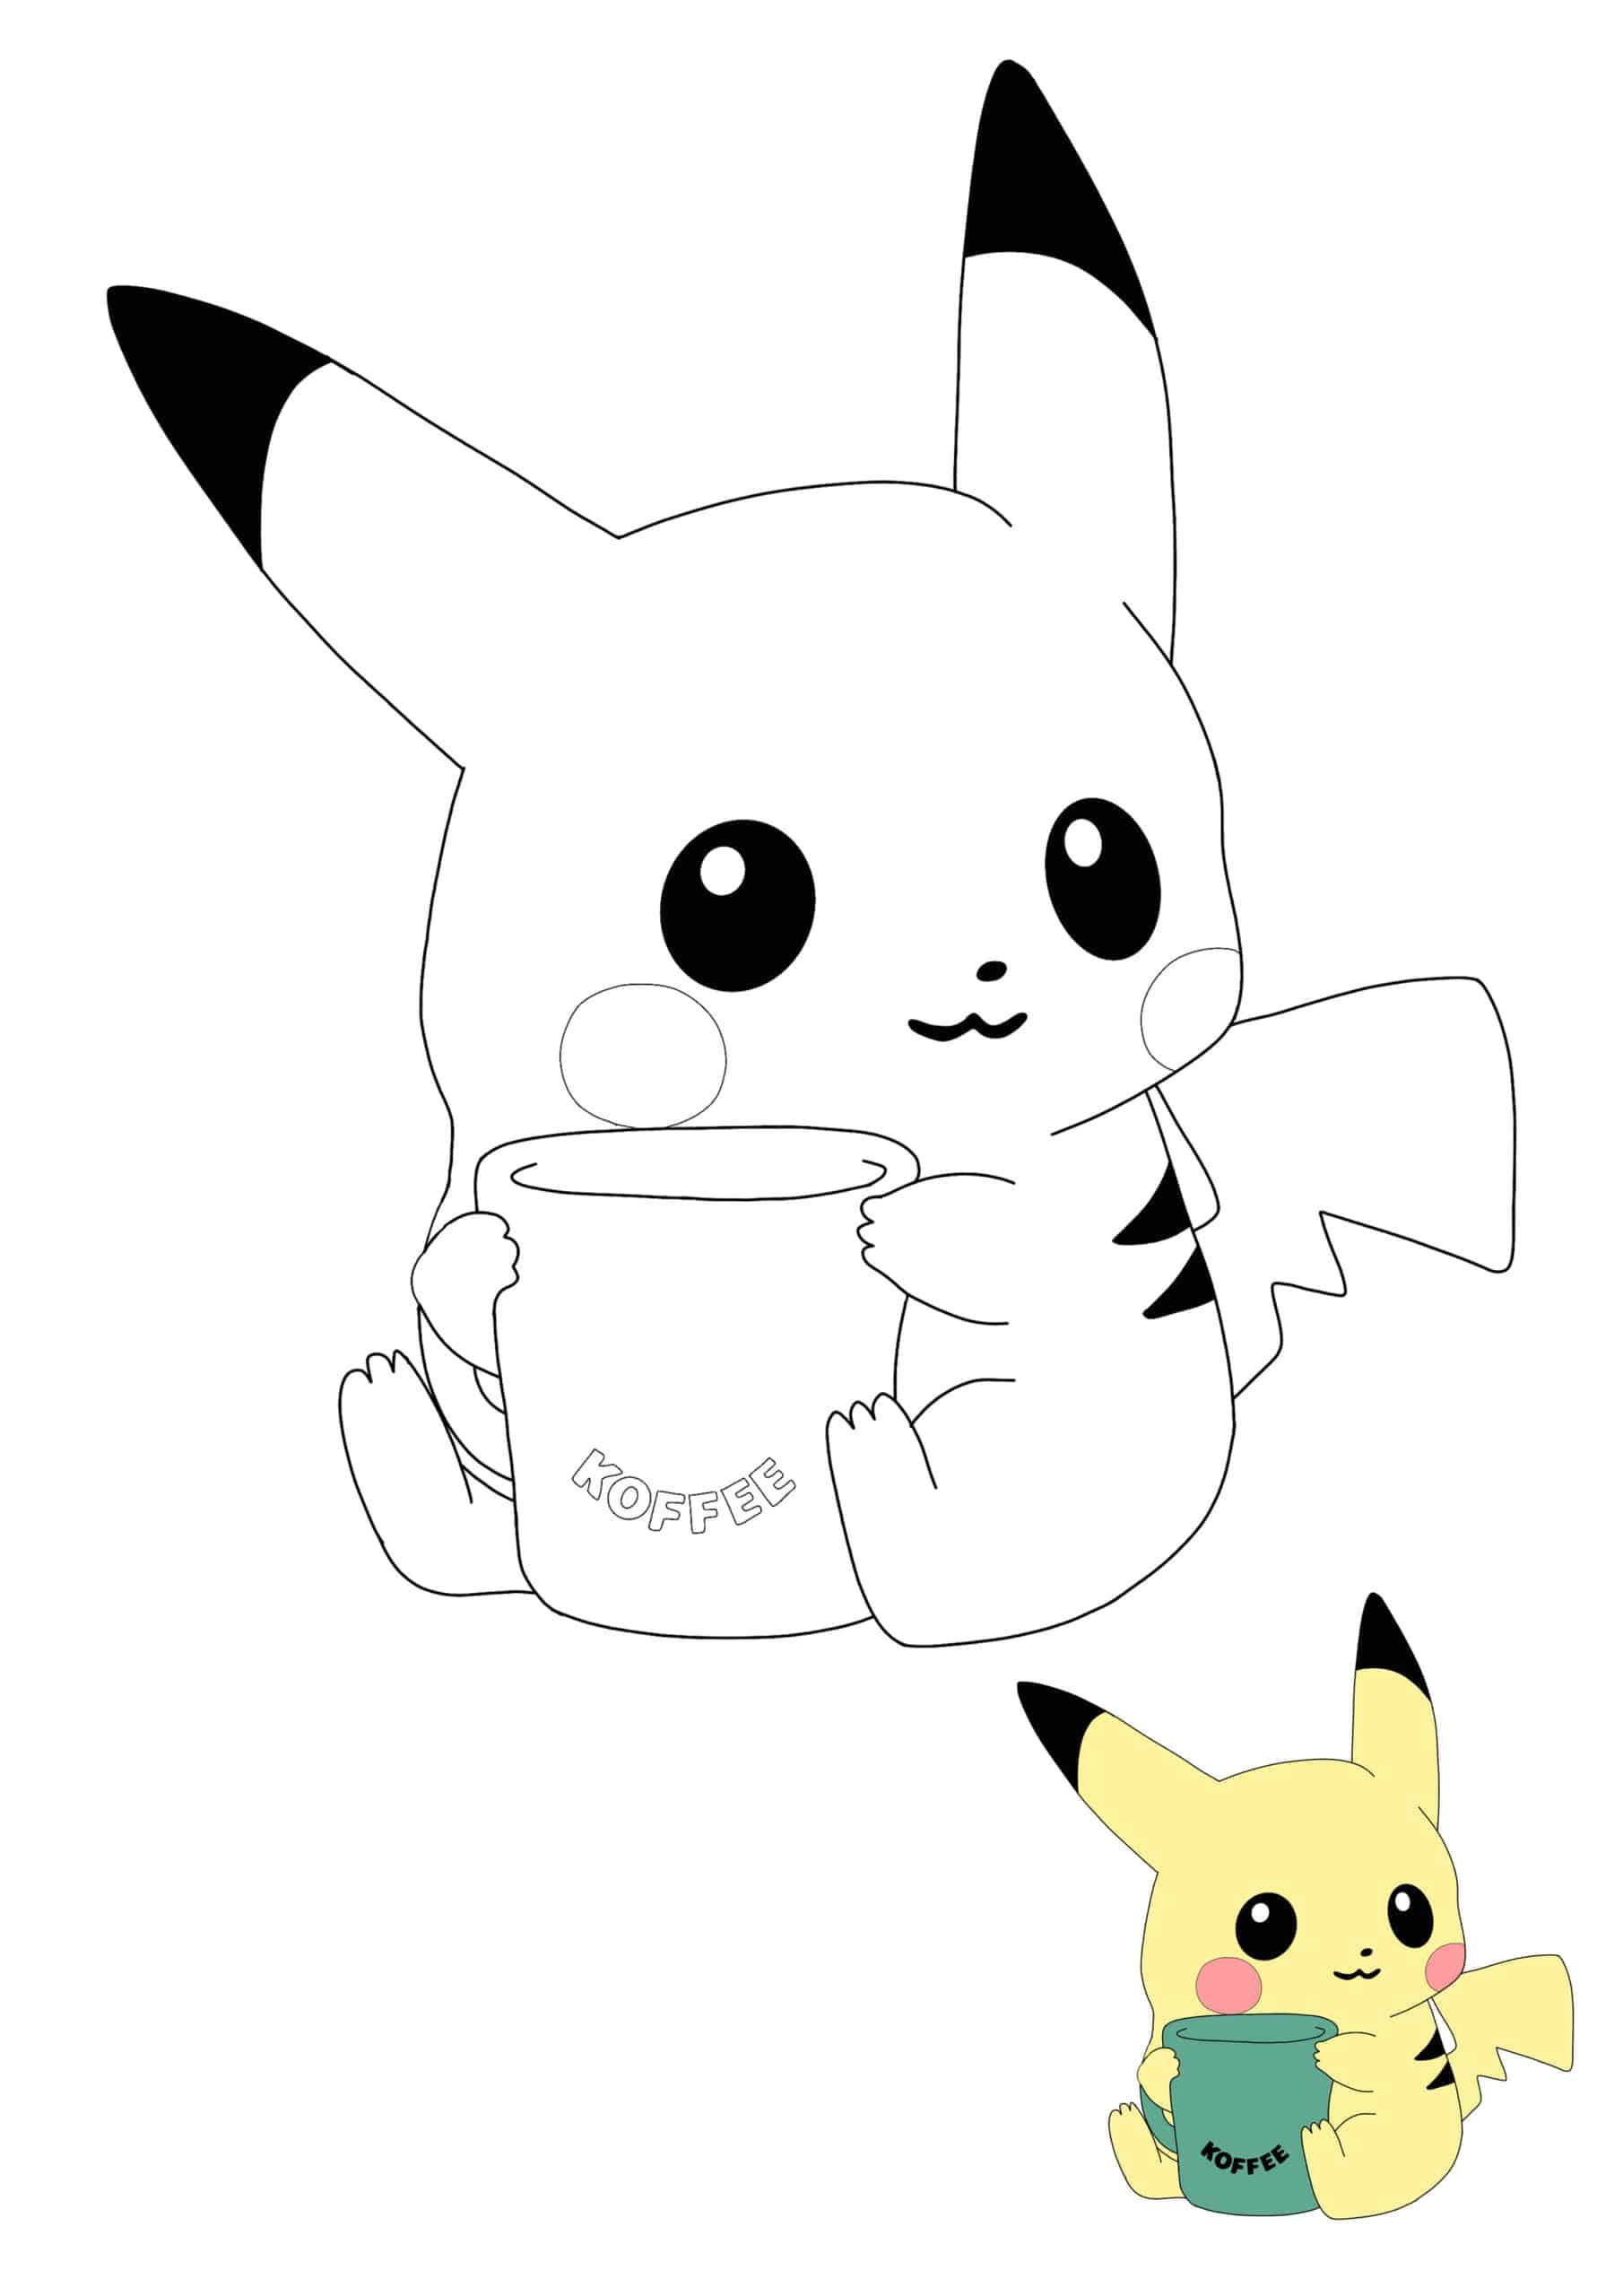 Cute Baby Pikachu with coffee mug coloring page